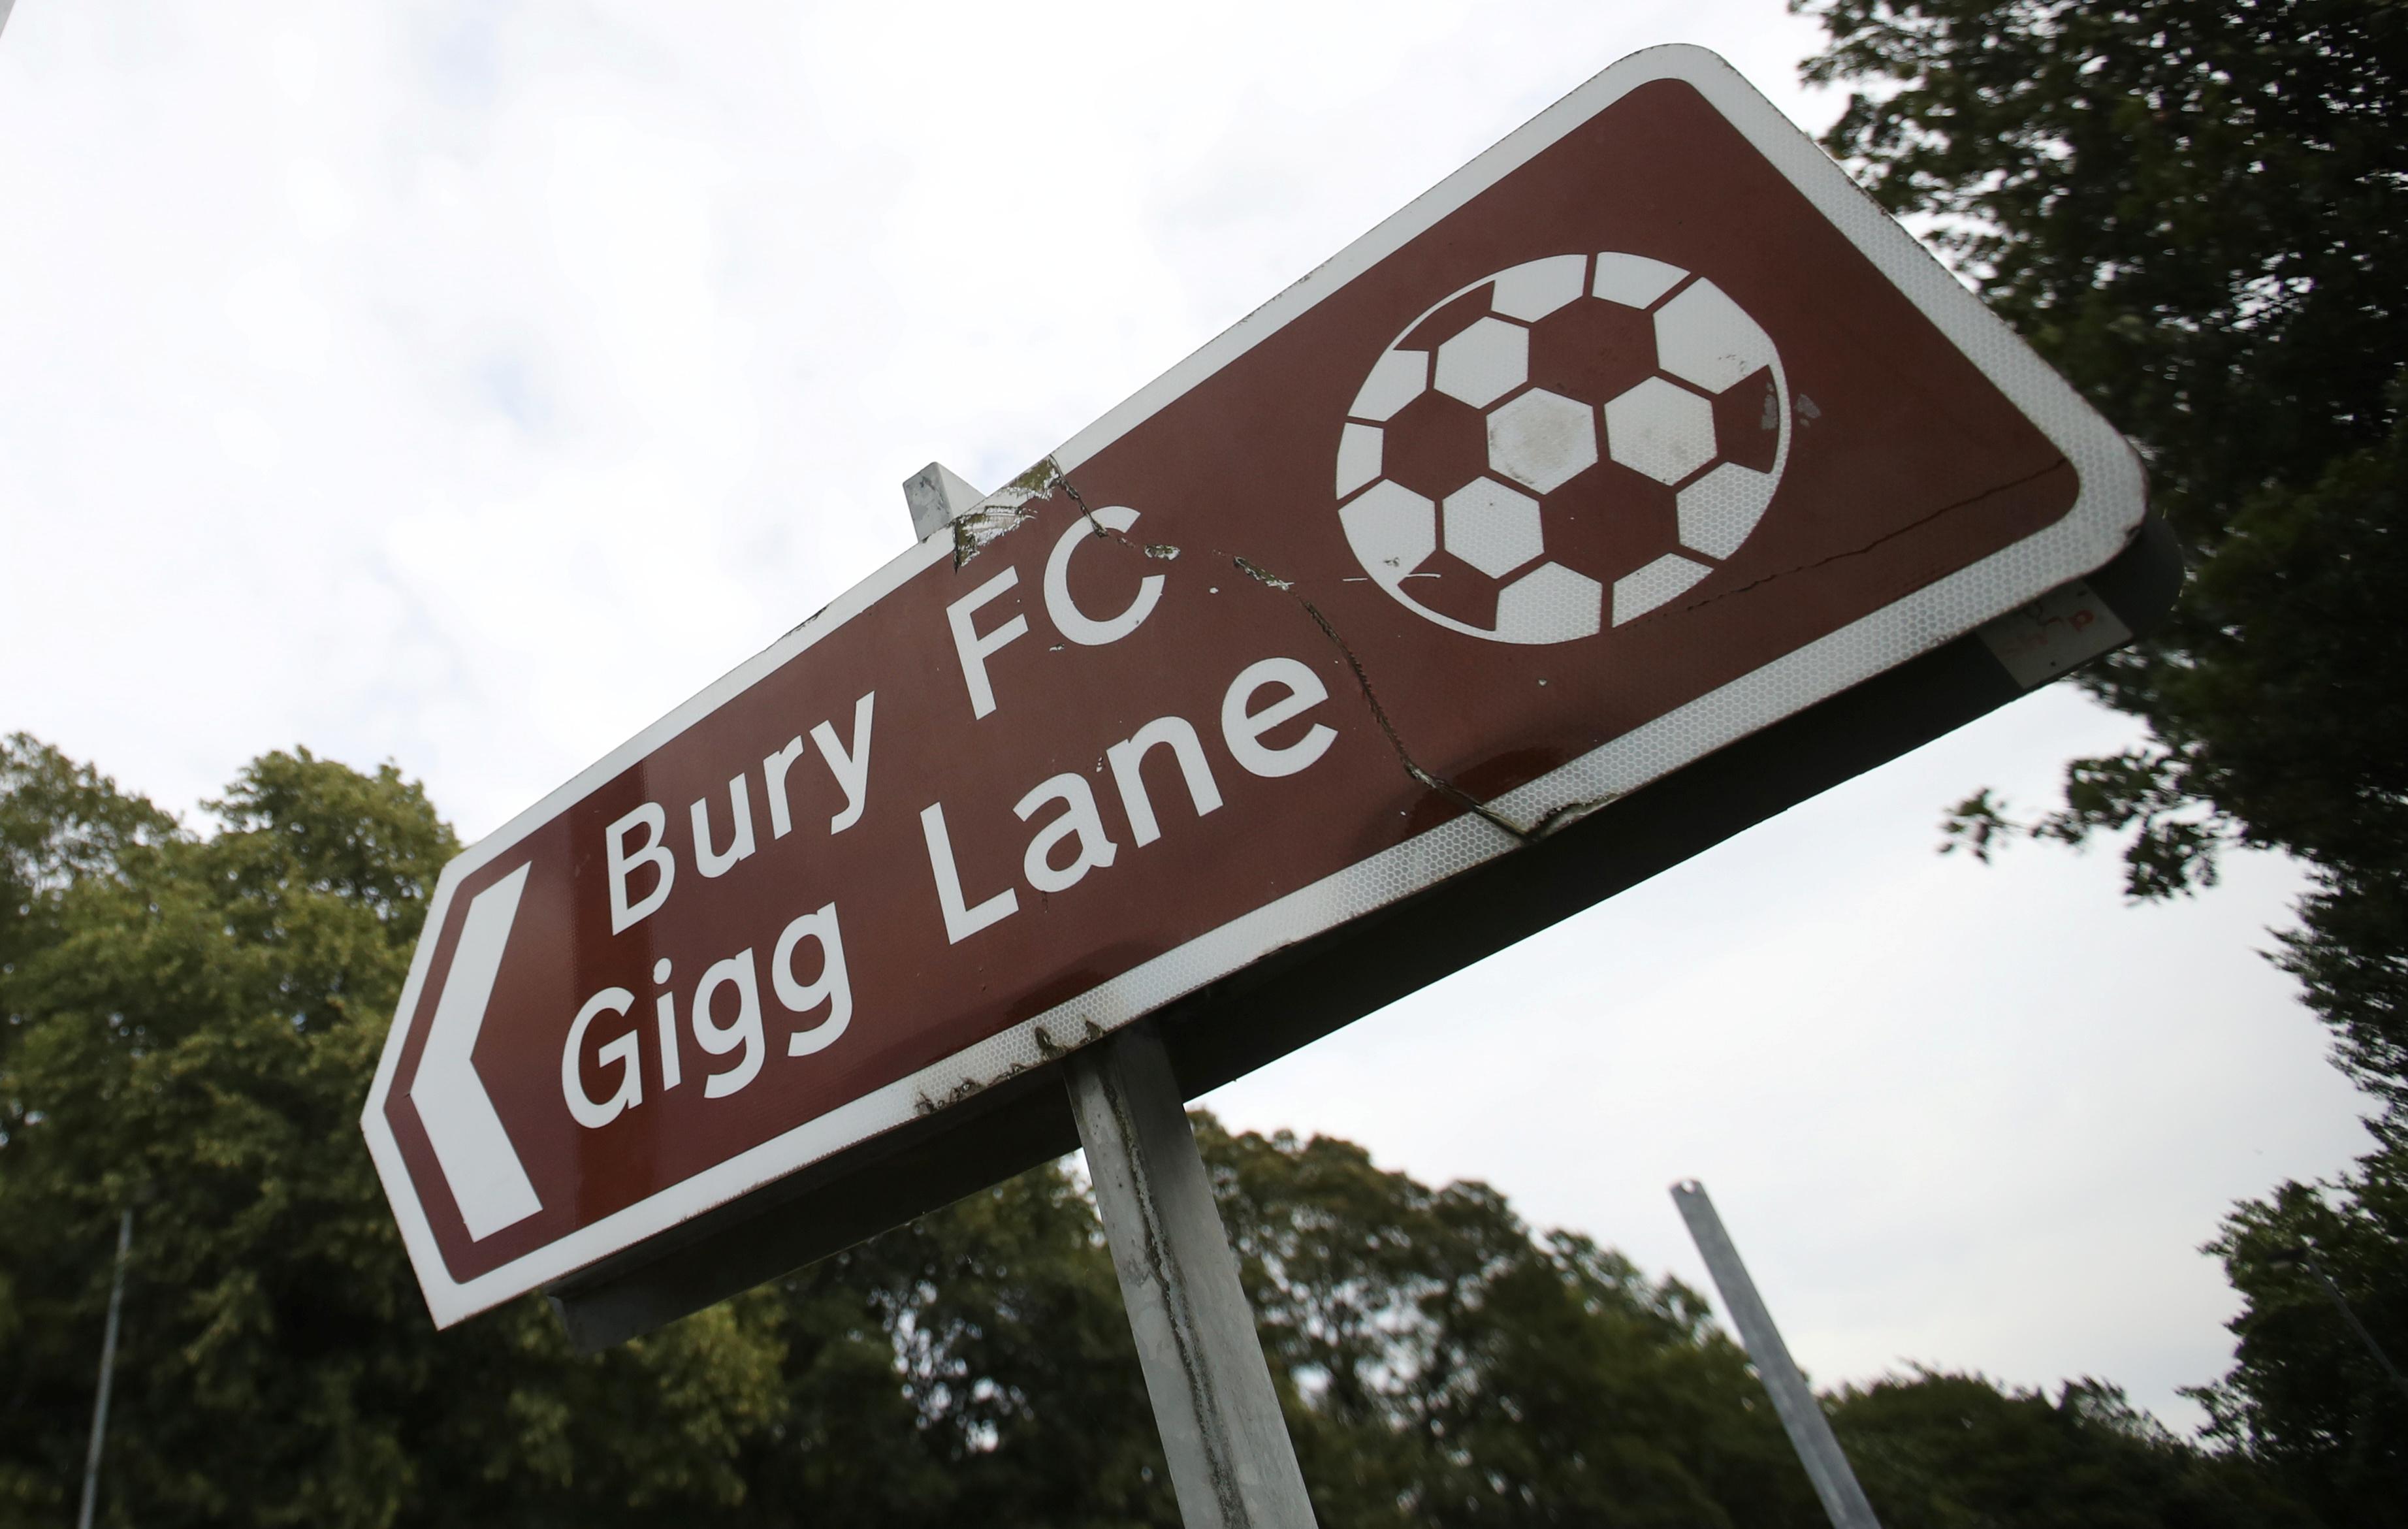 Bury Players Salaries 2021